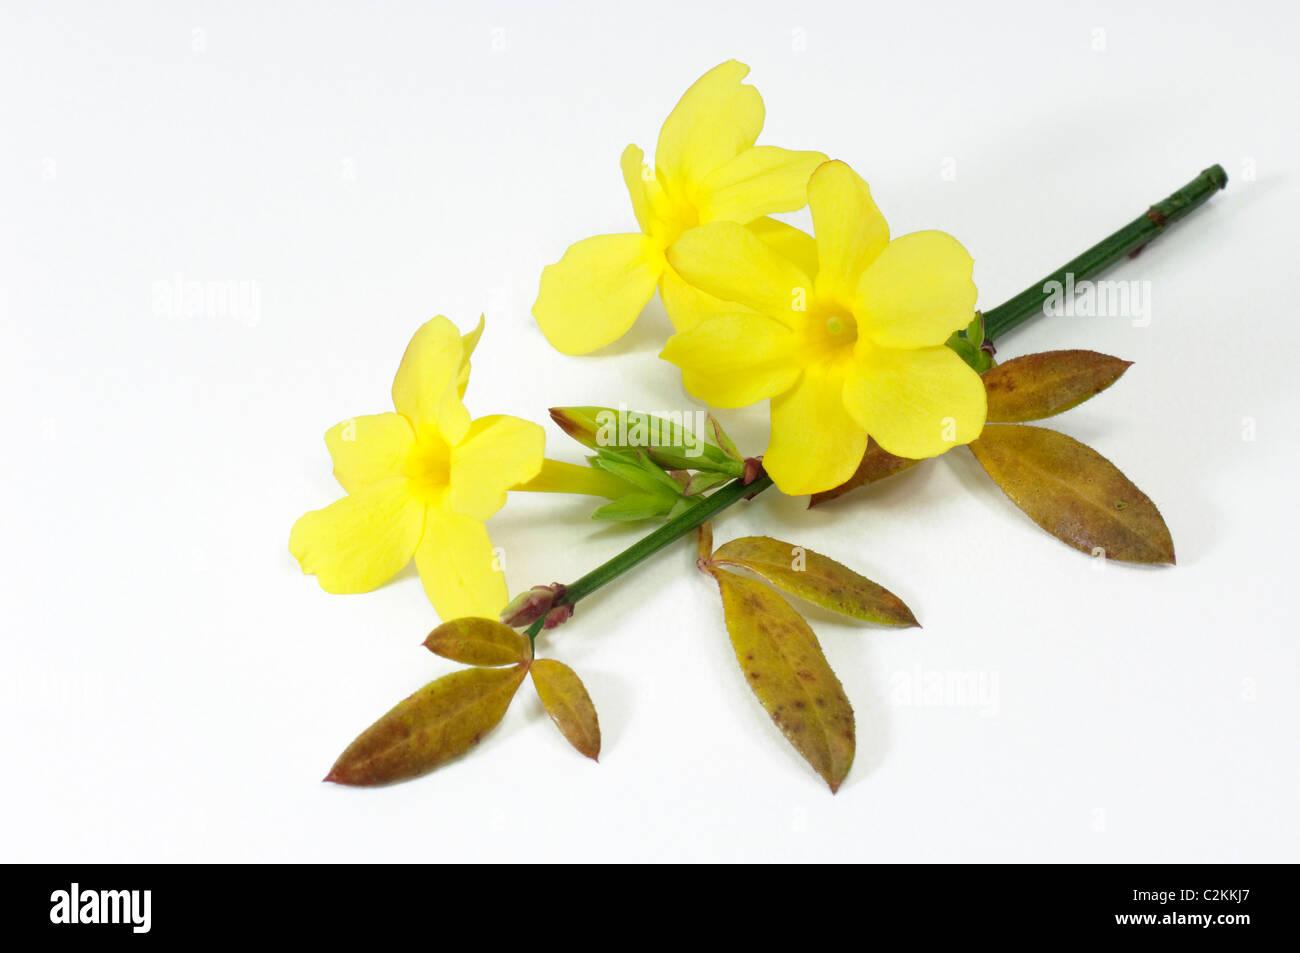 Winter Jasmine (Jasminum nudiflorum), flowering twig. Studio picture against a white background. - Stock Image